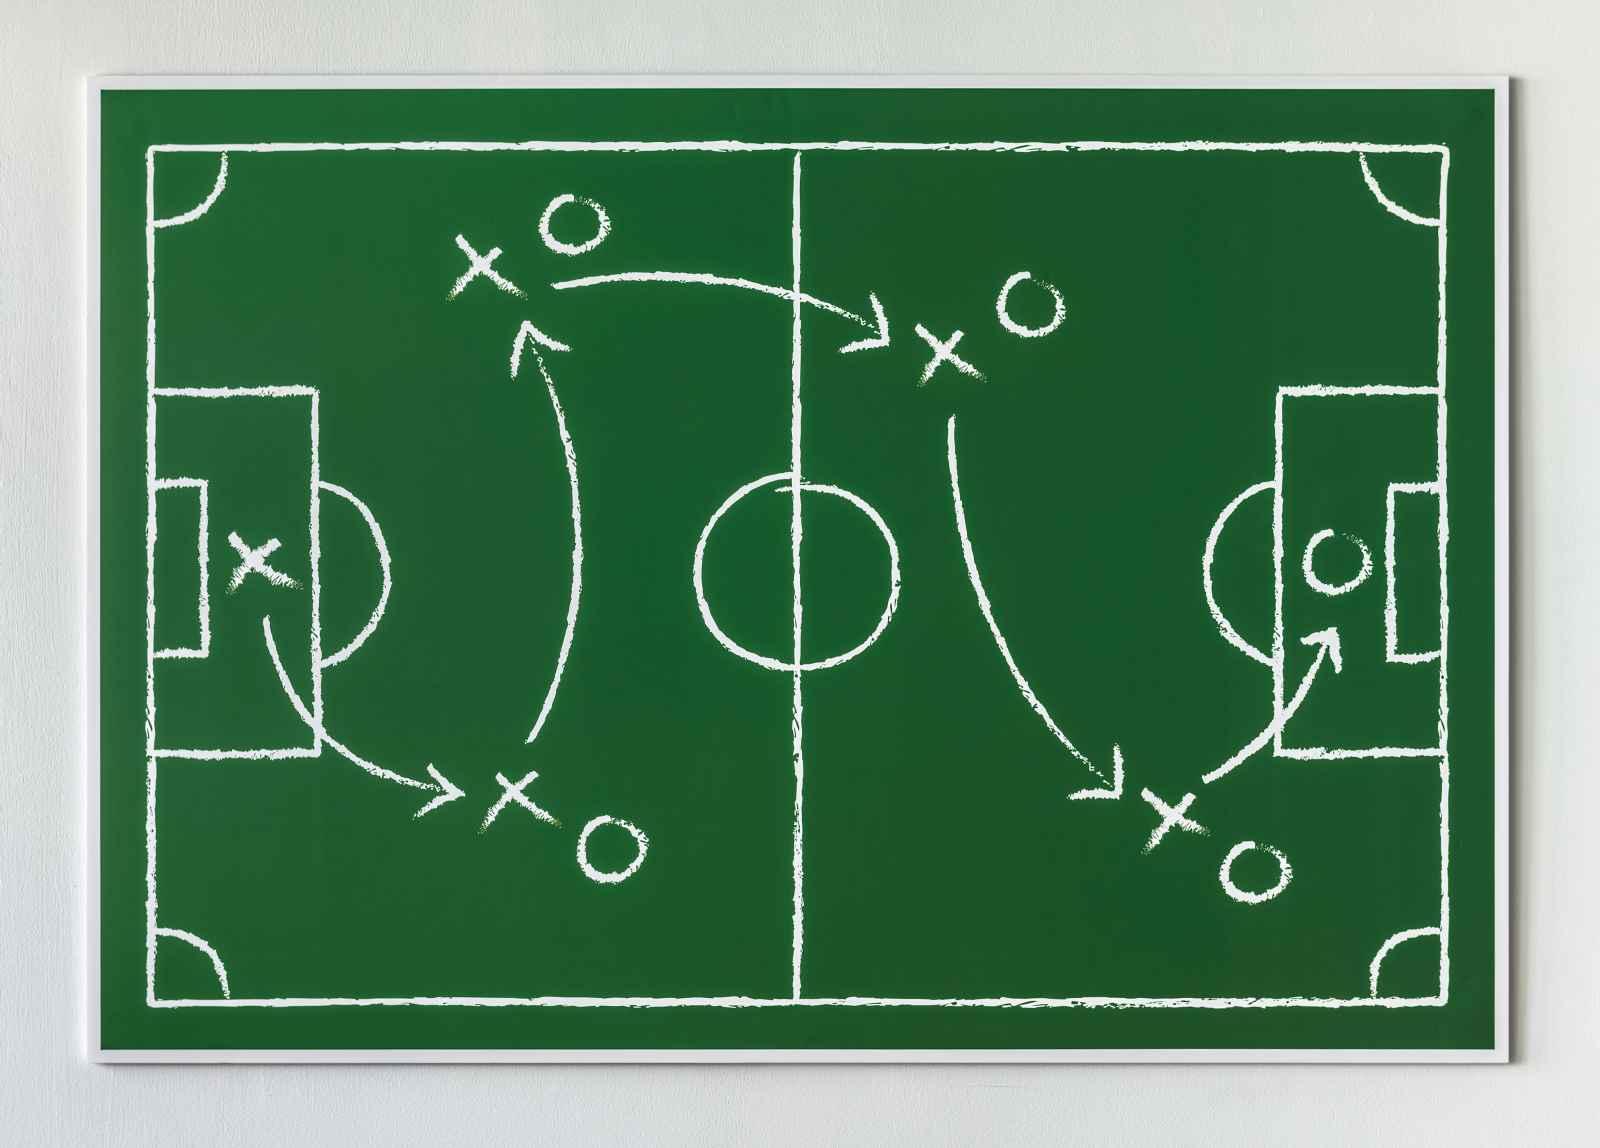 basketball strategy drawing board-regulation